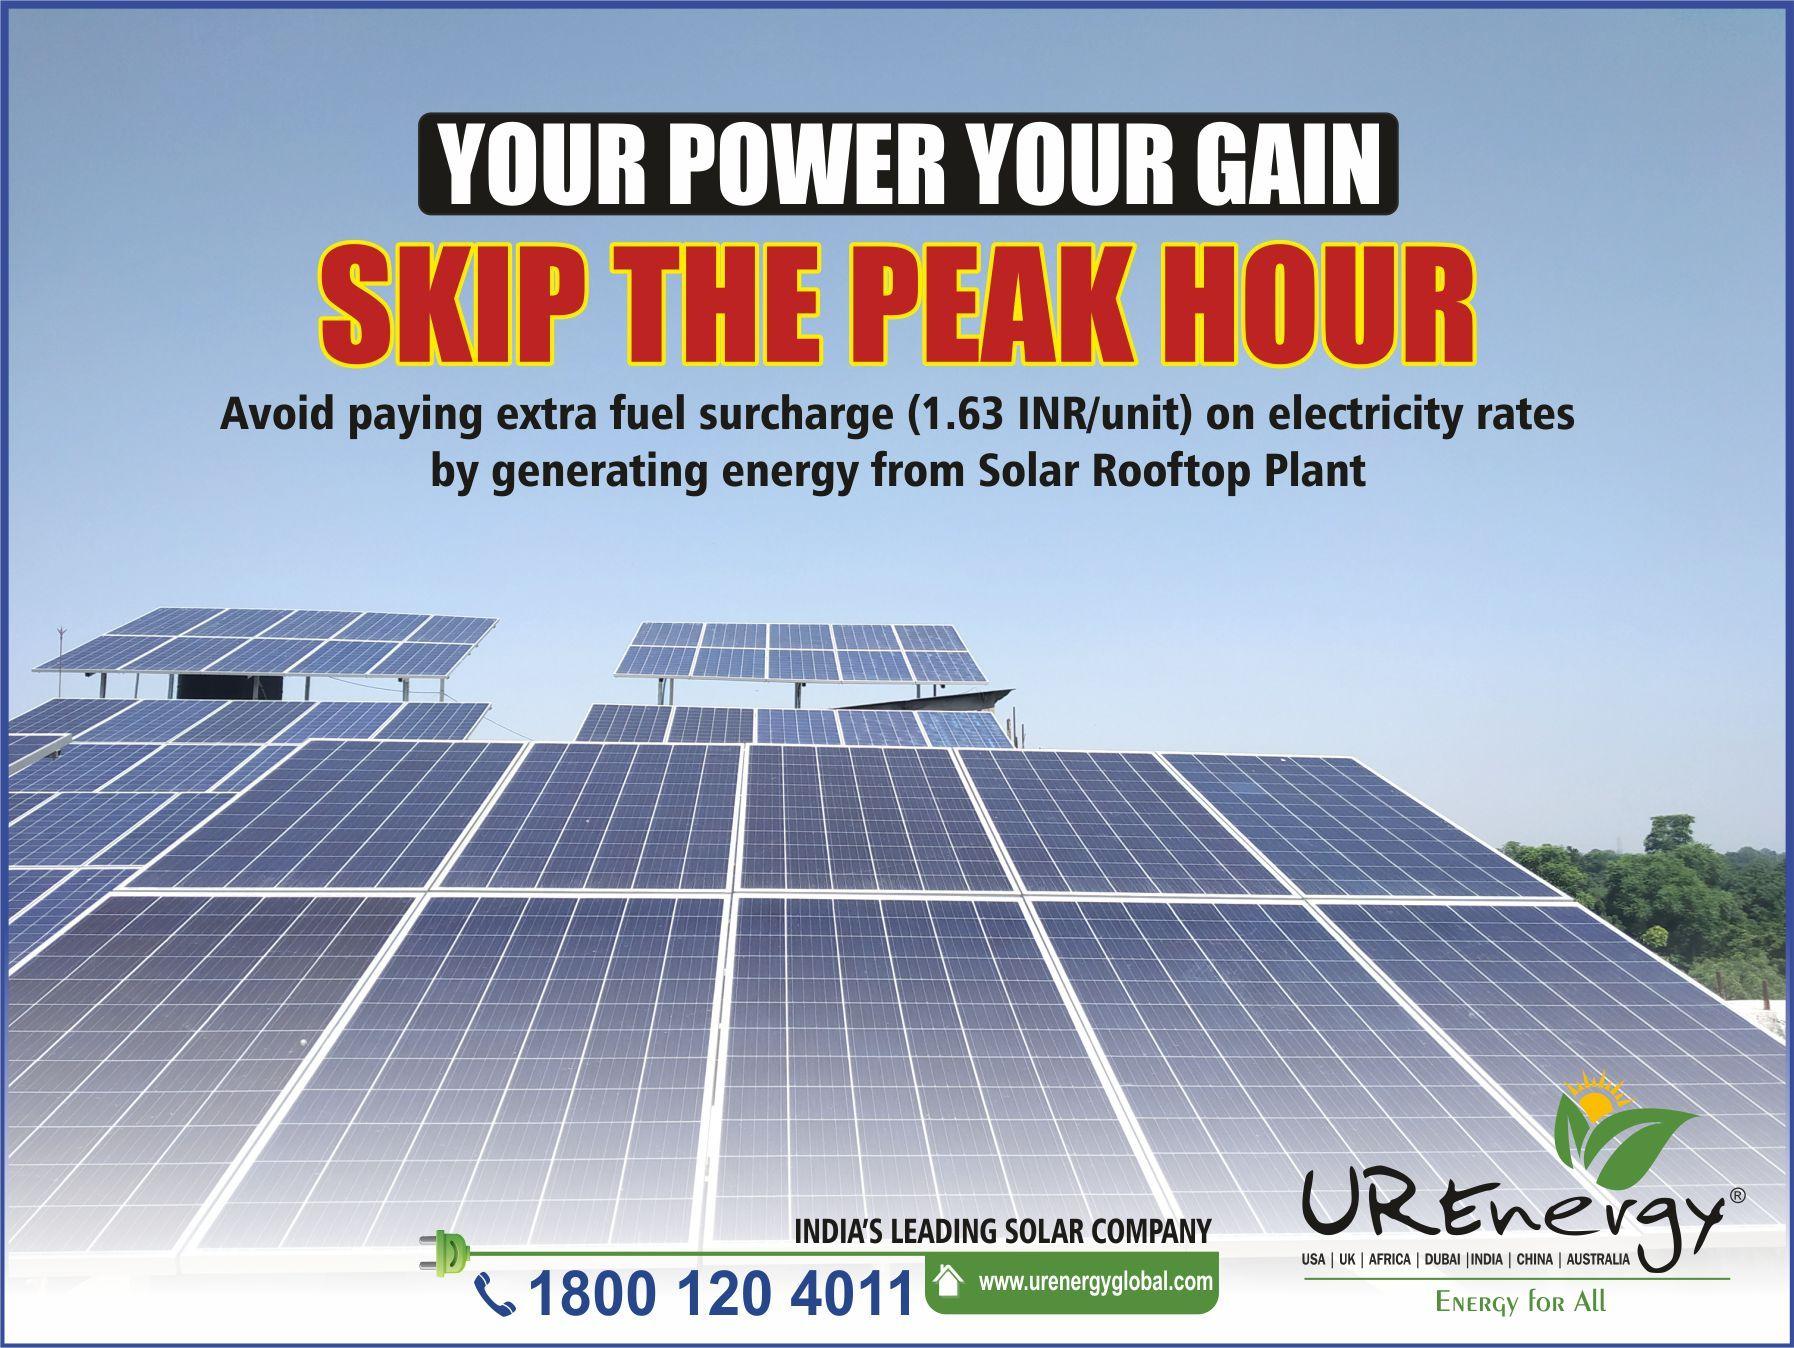 Rooftop Solar Panel Inverters Water Pump Solar Epc Gujarat India U R Energy Solar Water Pump Solar Energy